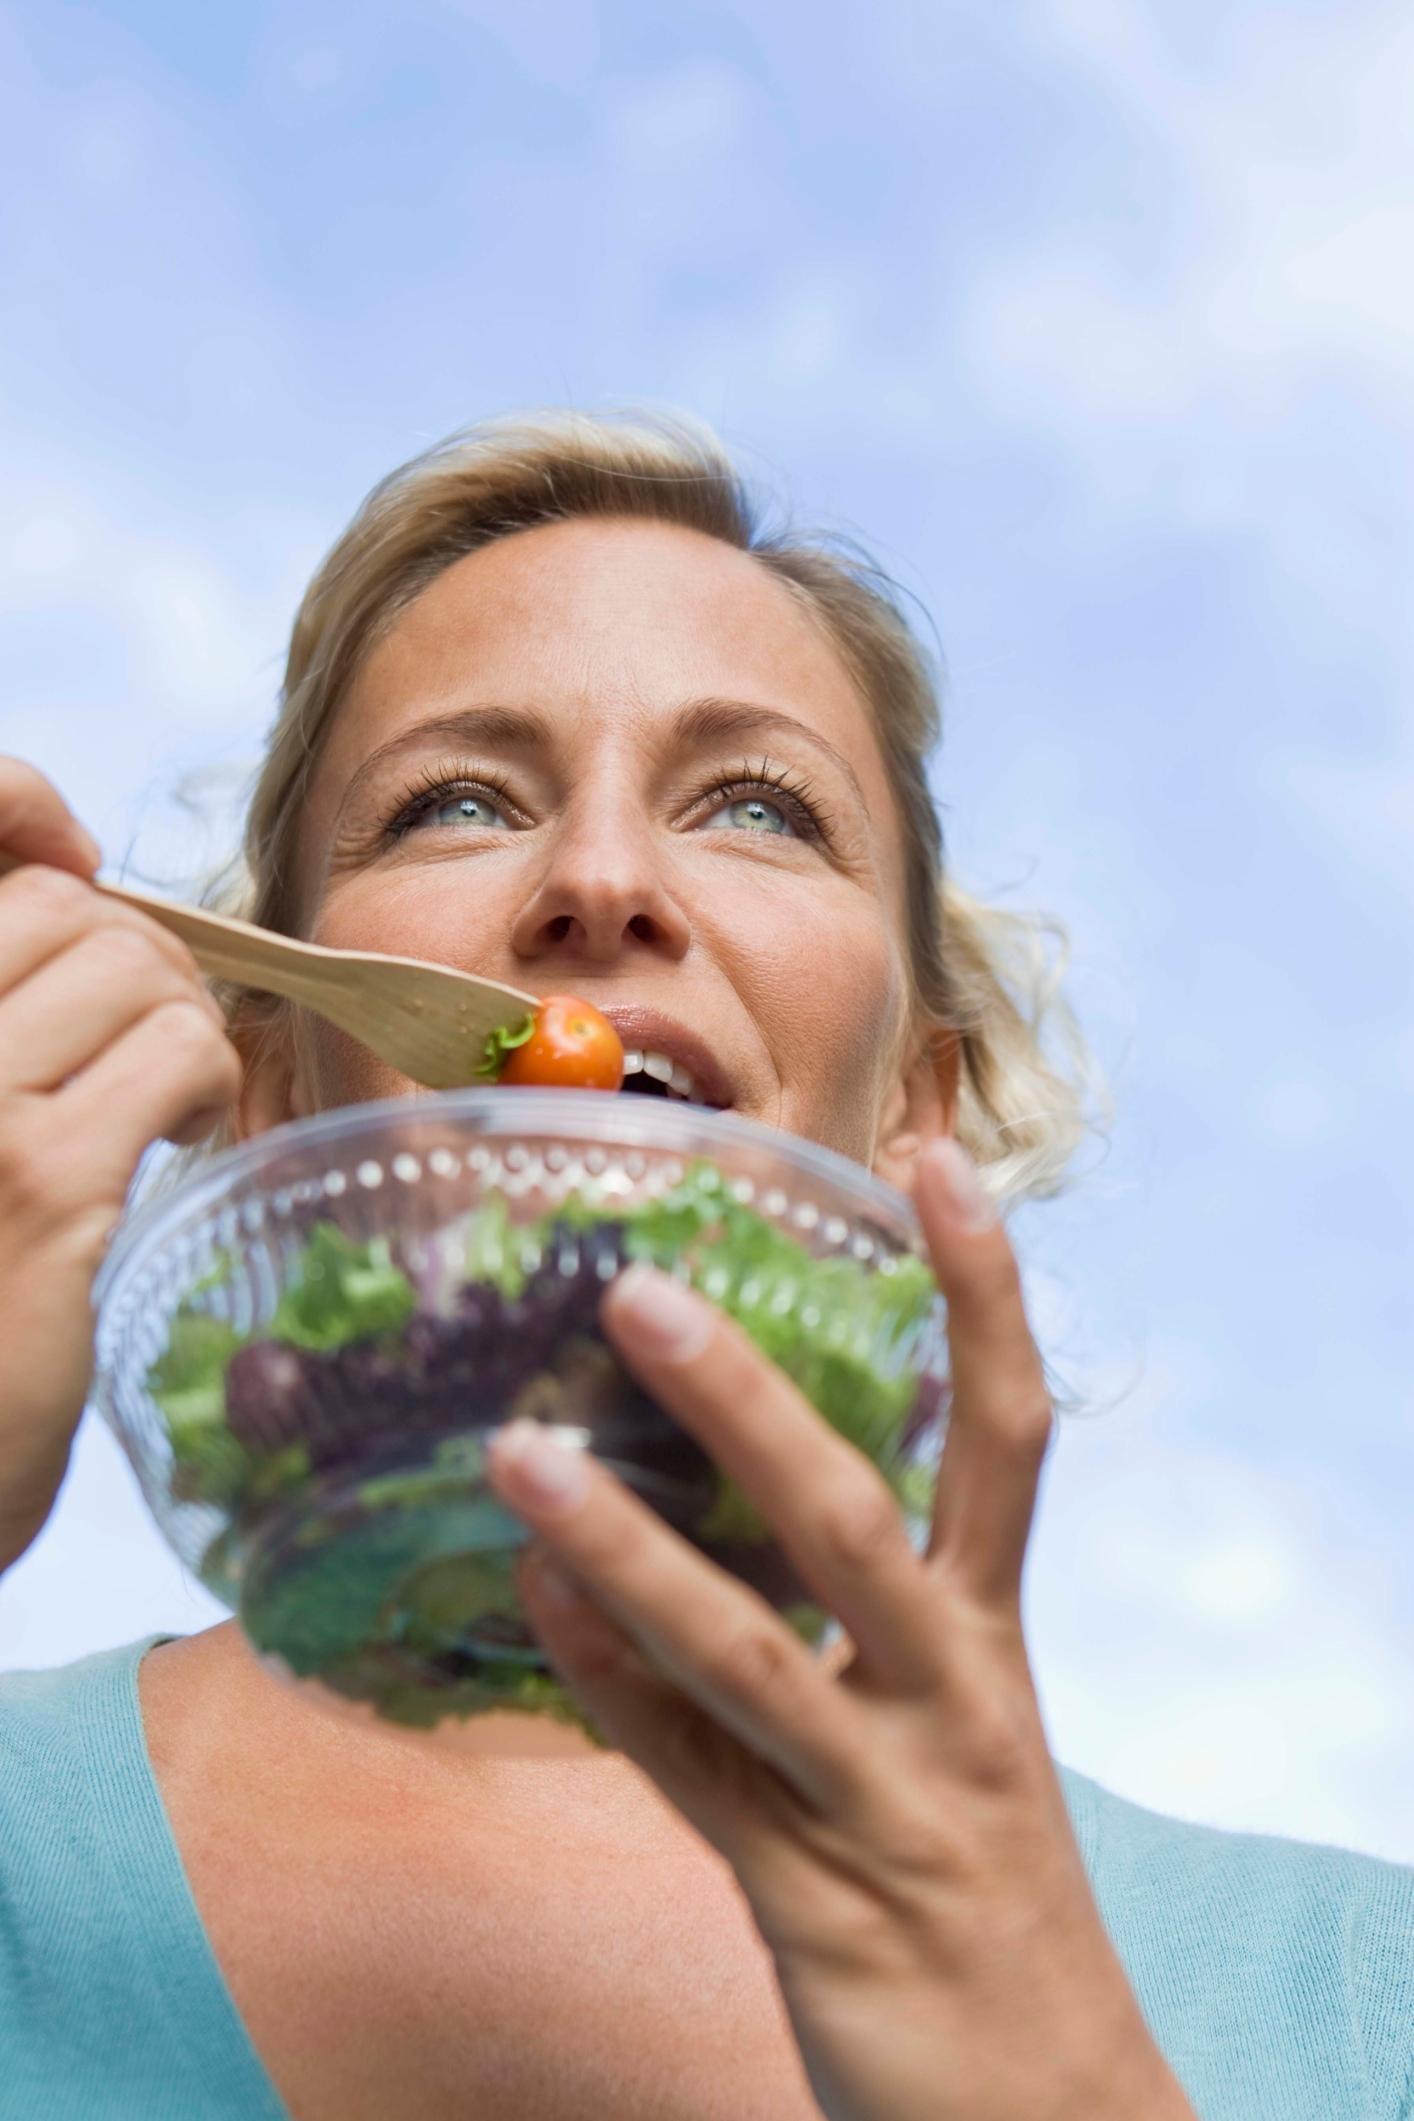 Five Foods Low In Fat & Sugar